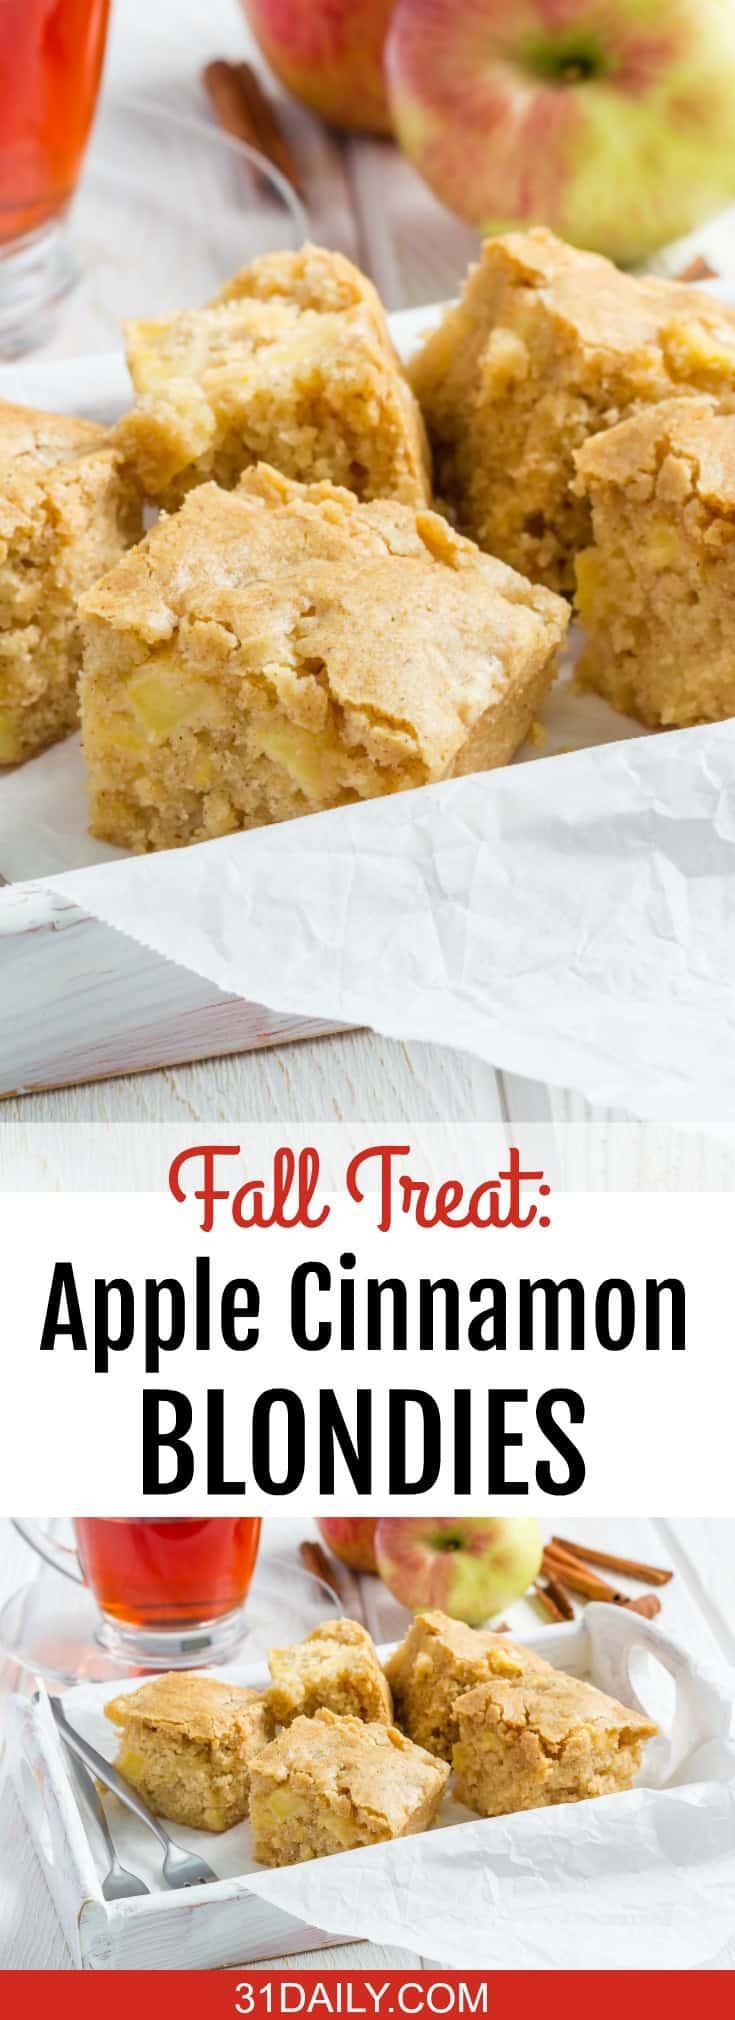 Apple Cinnamon Blondies Recipe | A Perfect Fall Treat | 31Daily.com